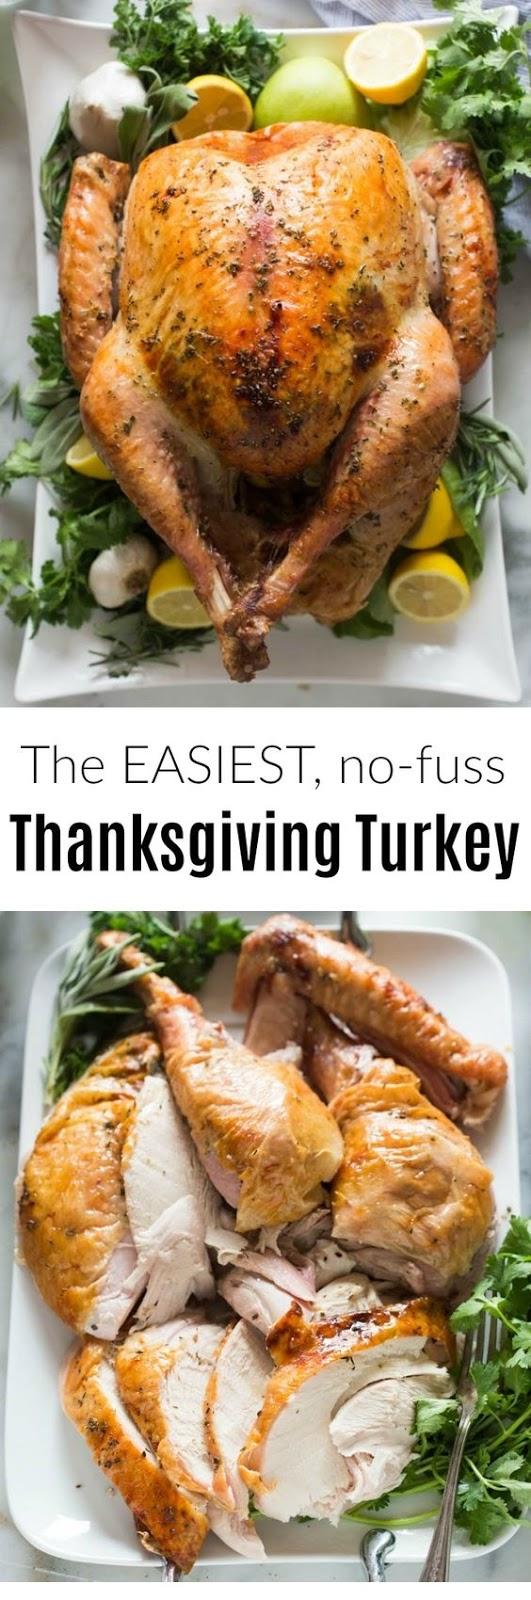 Easy, No Fuss Thanksgiving Turkey